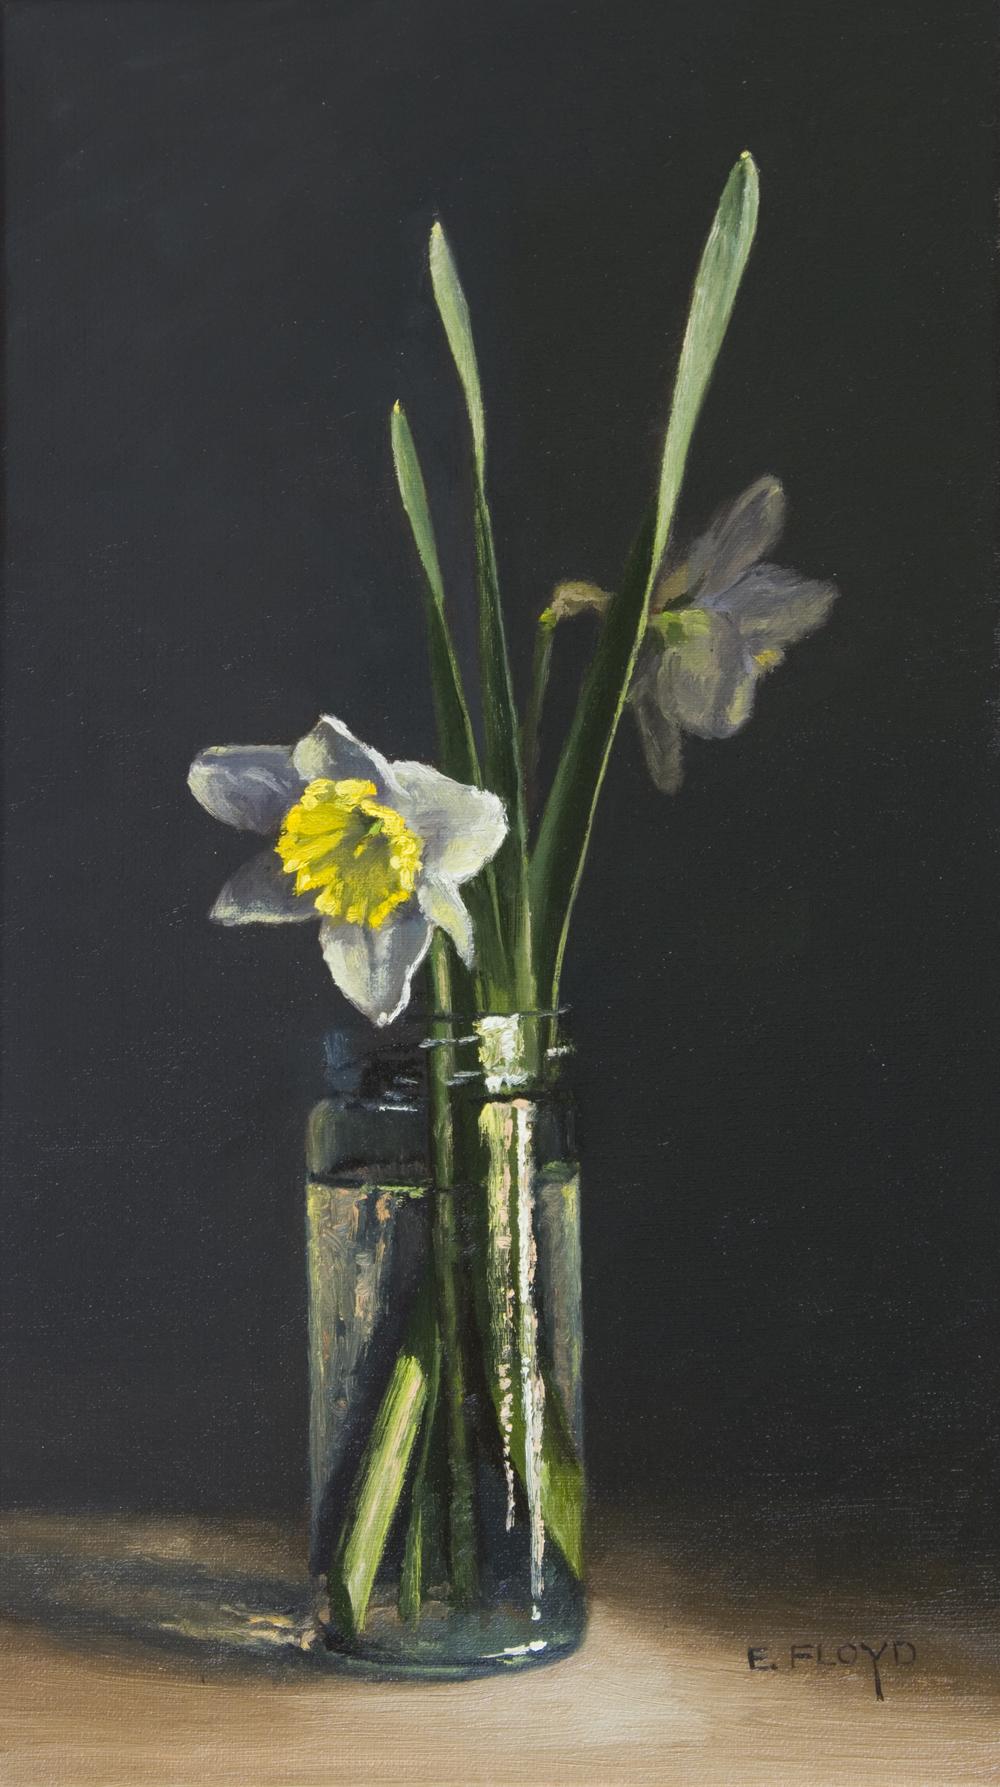 20170305-002-Narcissus-Ice-Follies-16x9.jpg